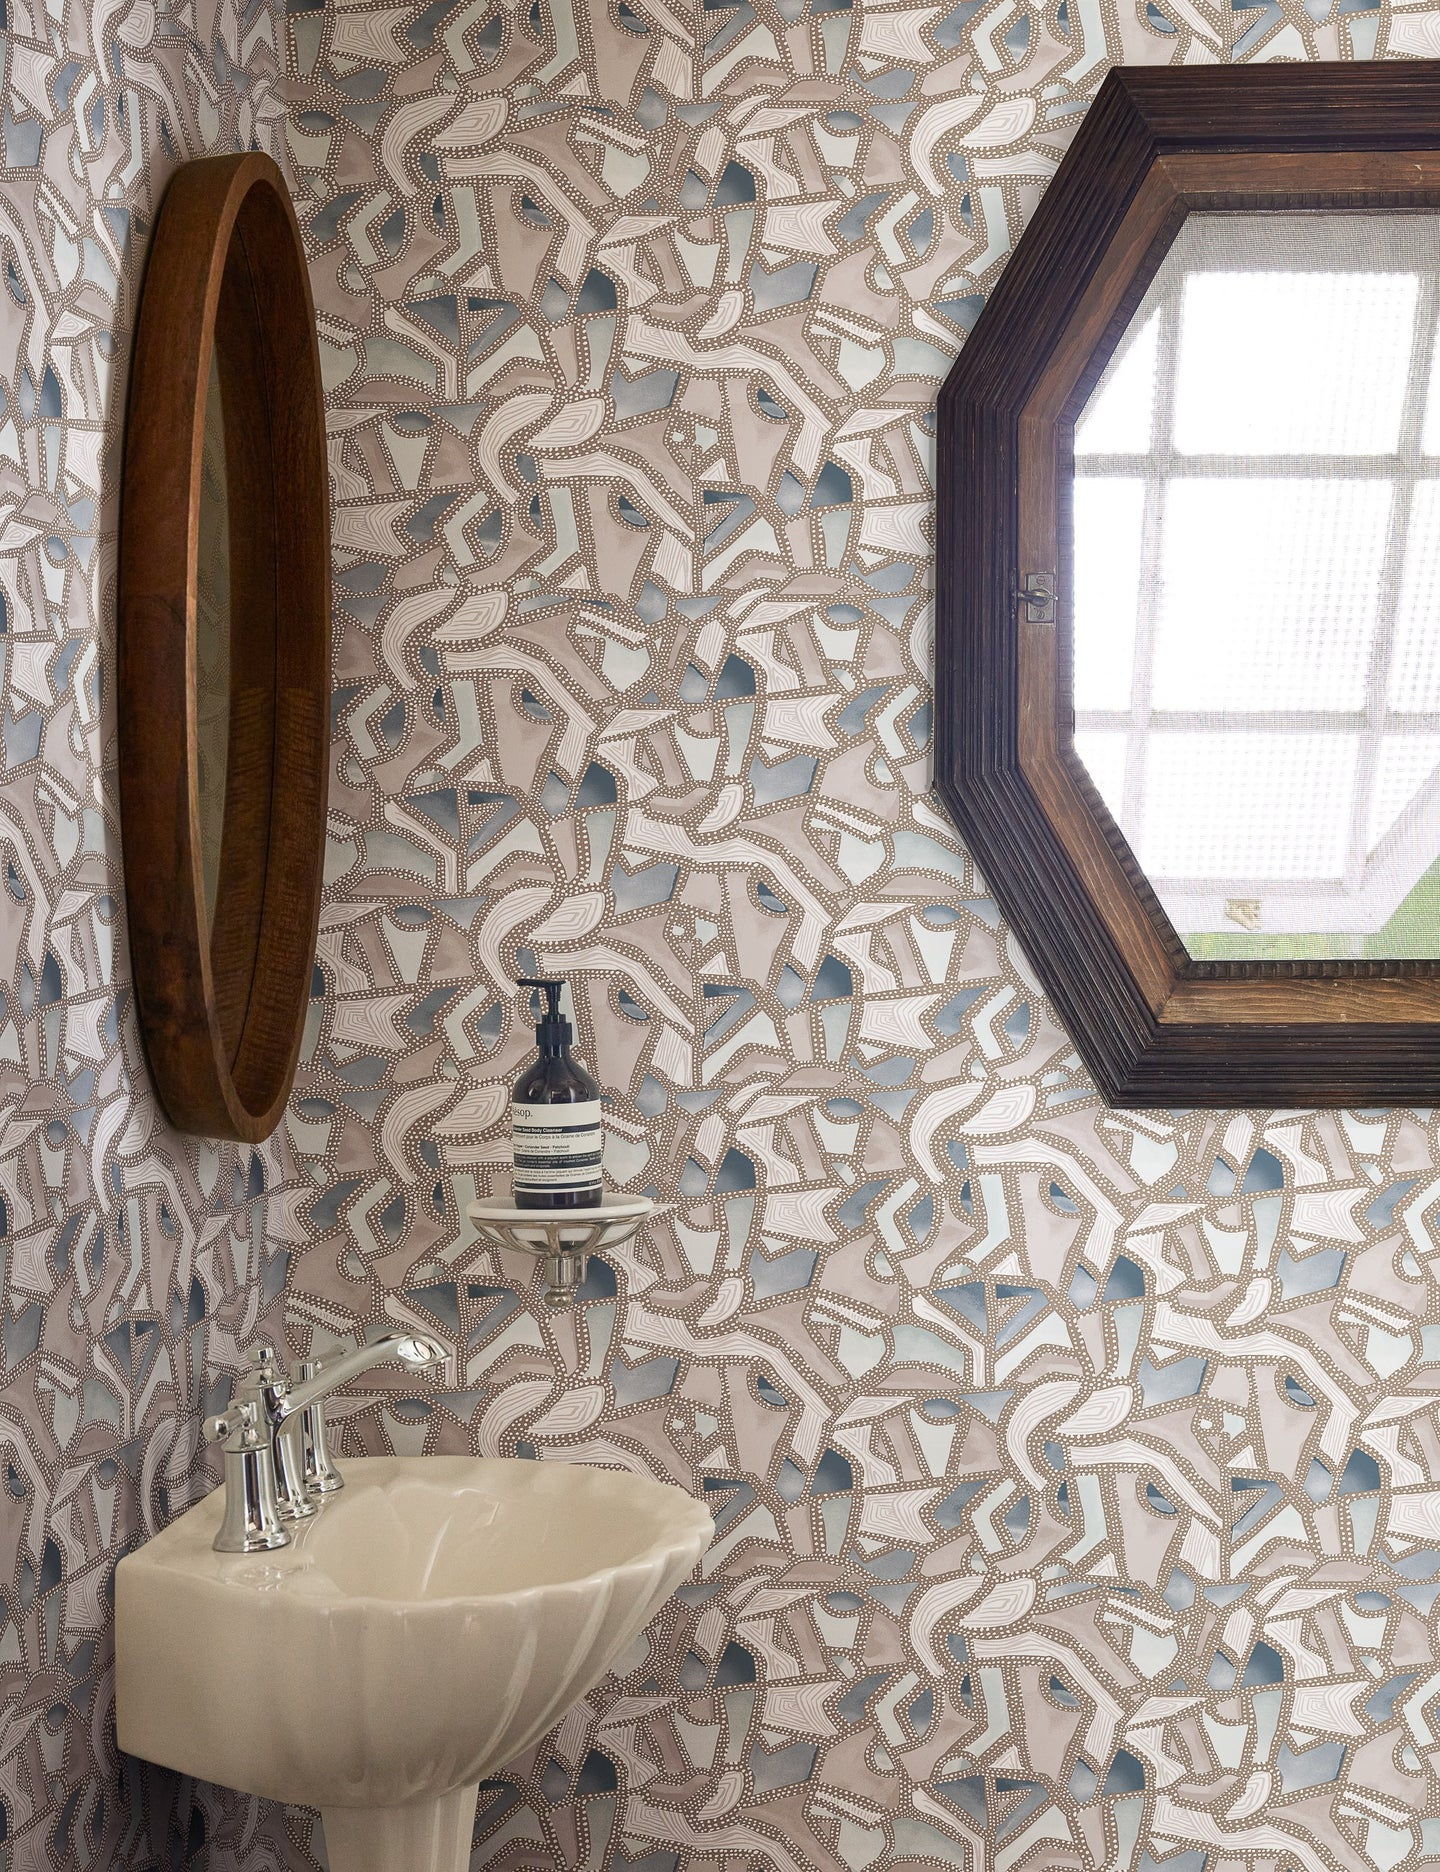 mosaic wallpaper in bathroom